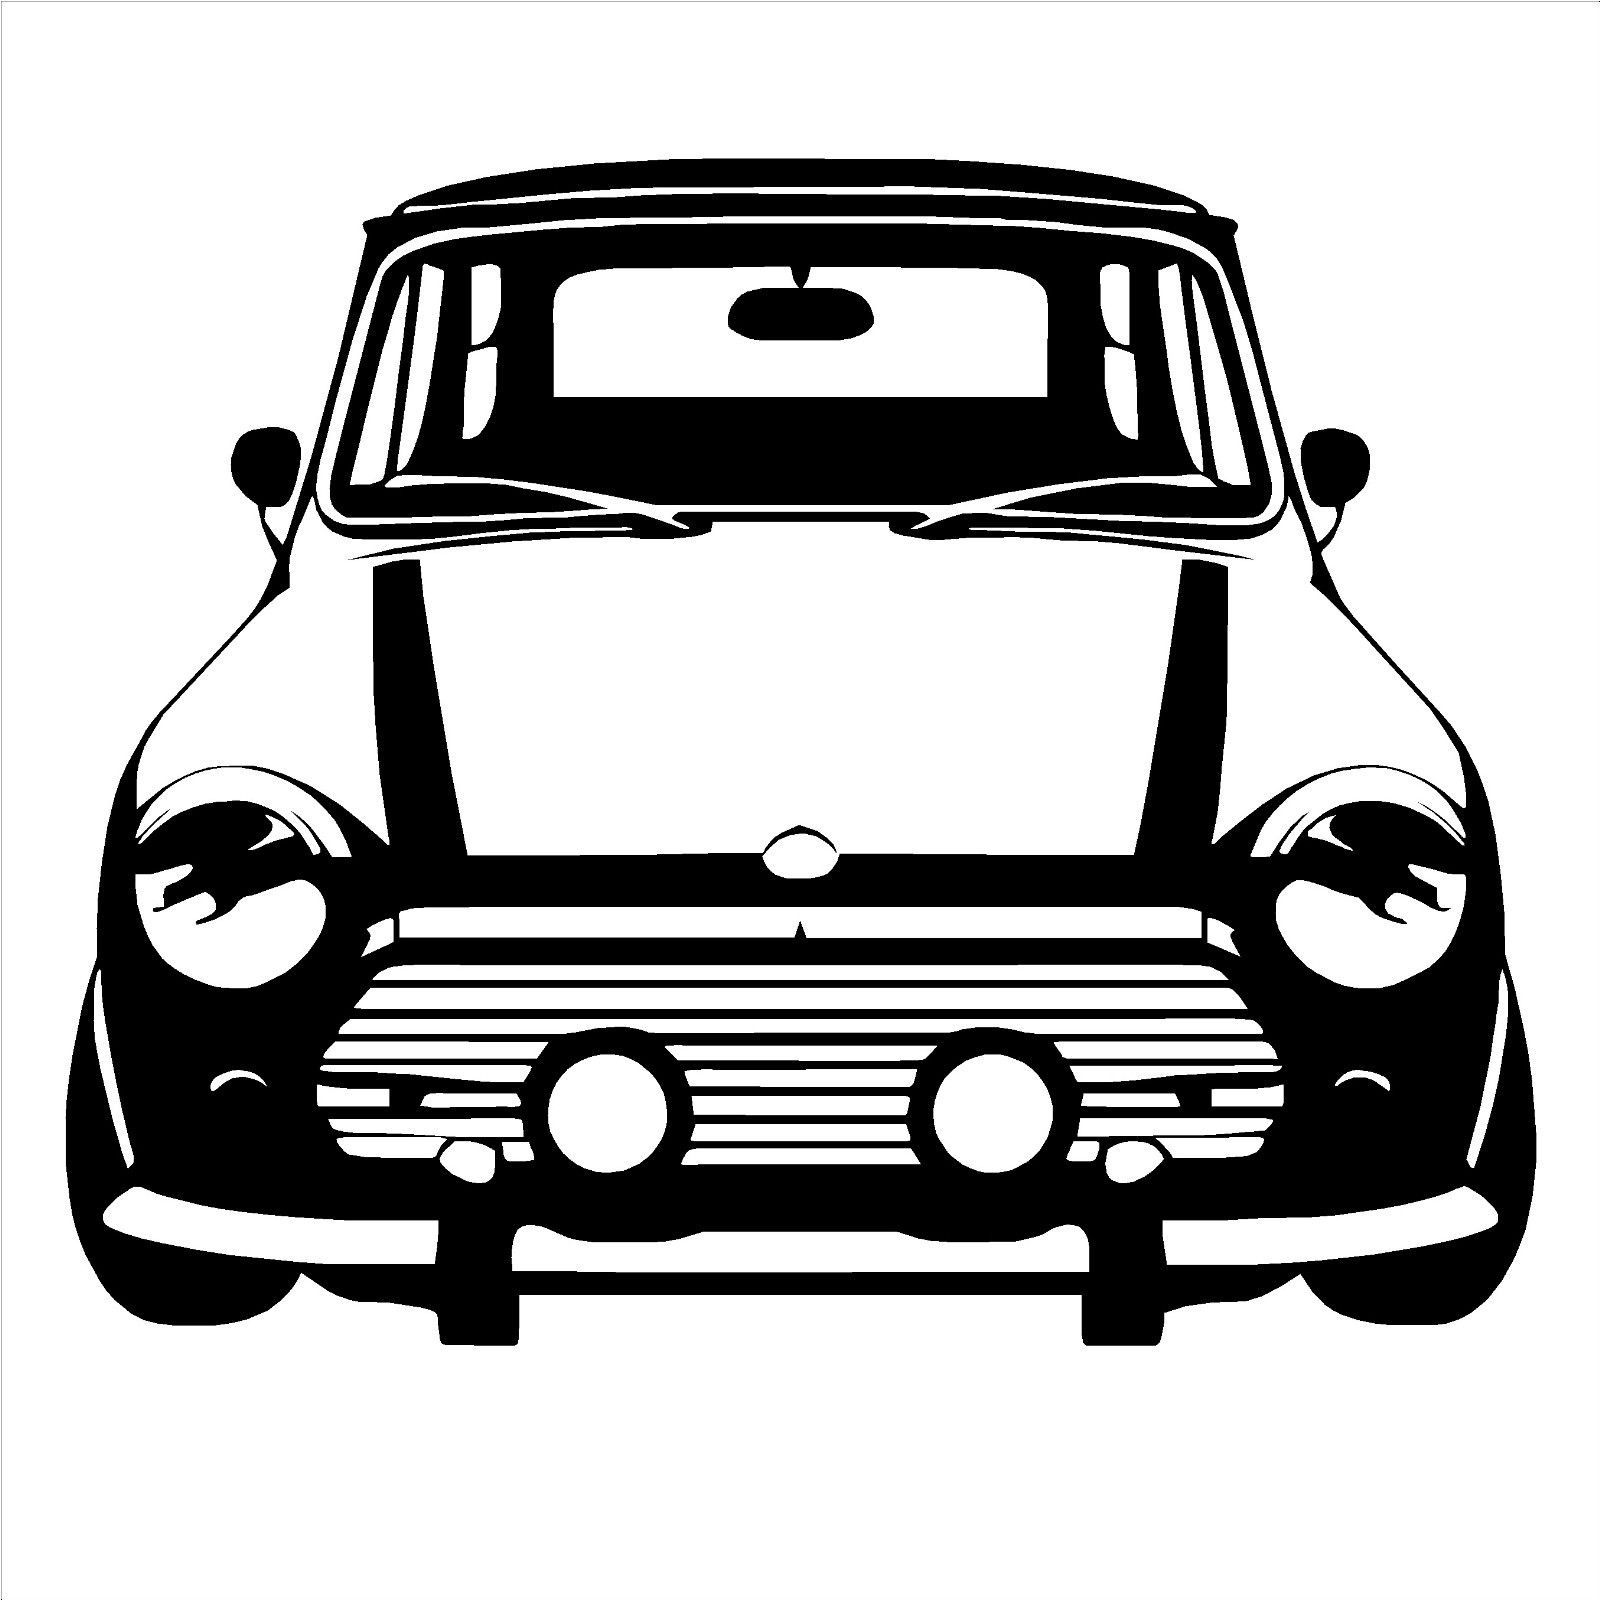 Old Mini Coopers >> Details about CLASSIC MINI COOPER Vinyl Wall Art car sticker room decal | Classic mini, Vinyl ...